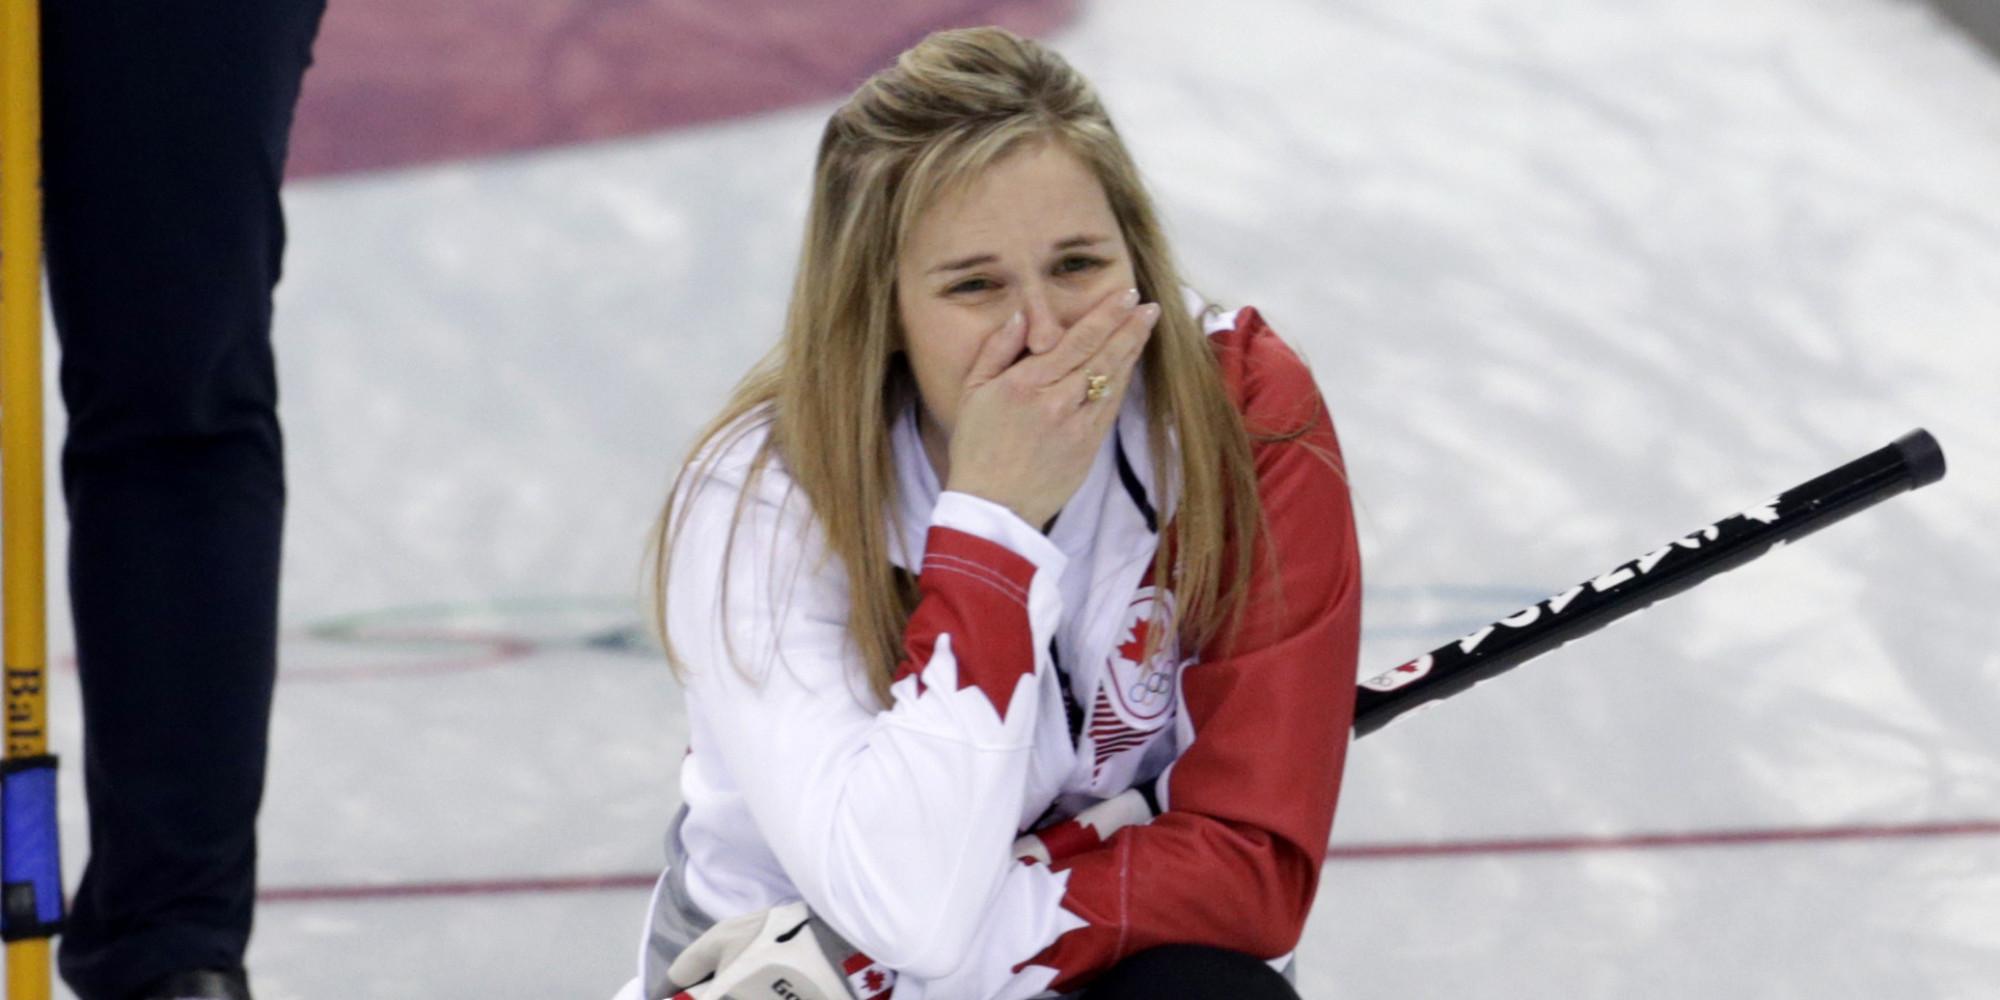 Jones Curling Gold Win Women's Curling Gold